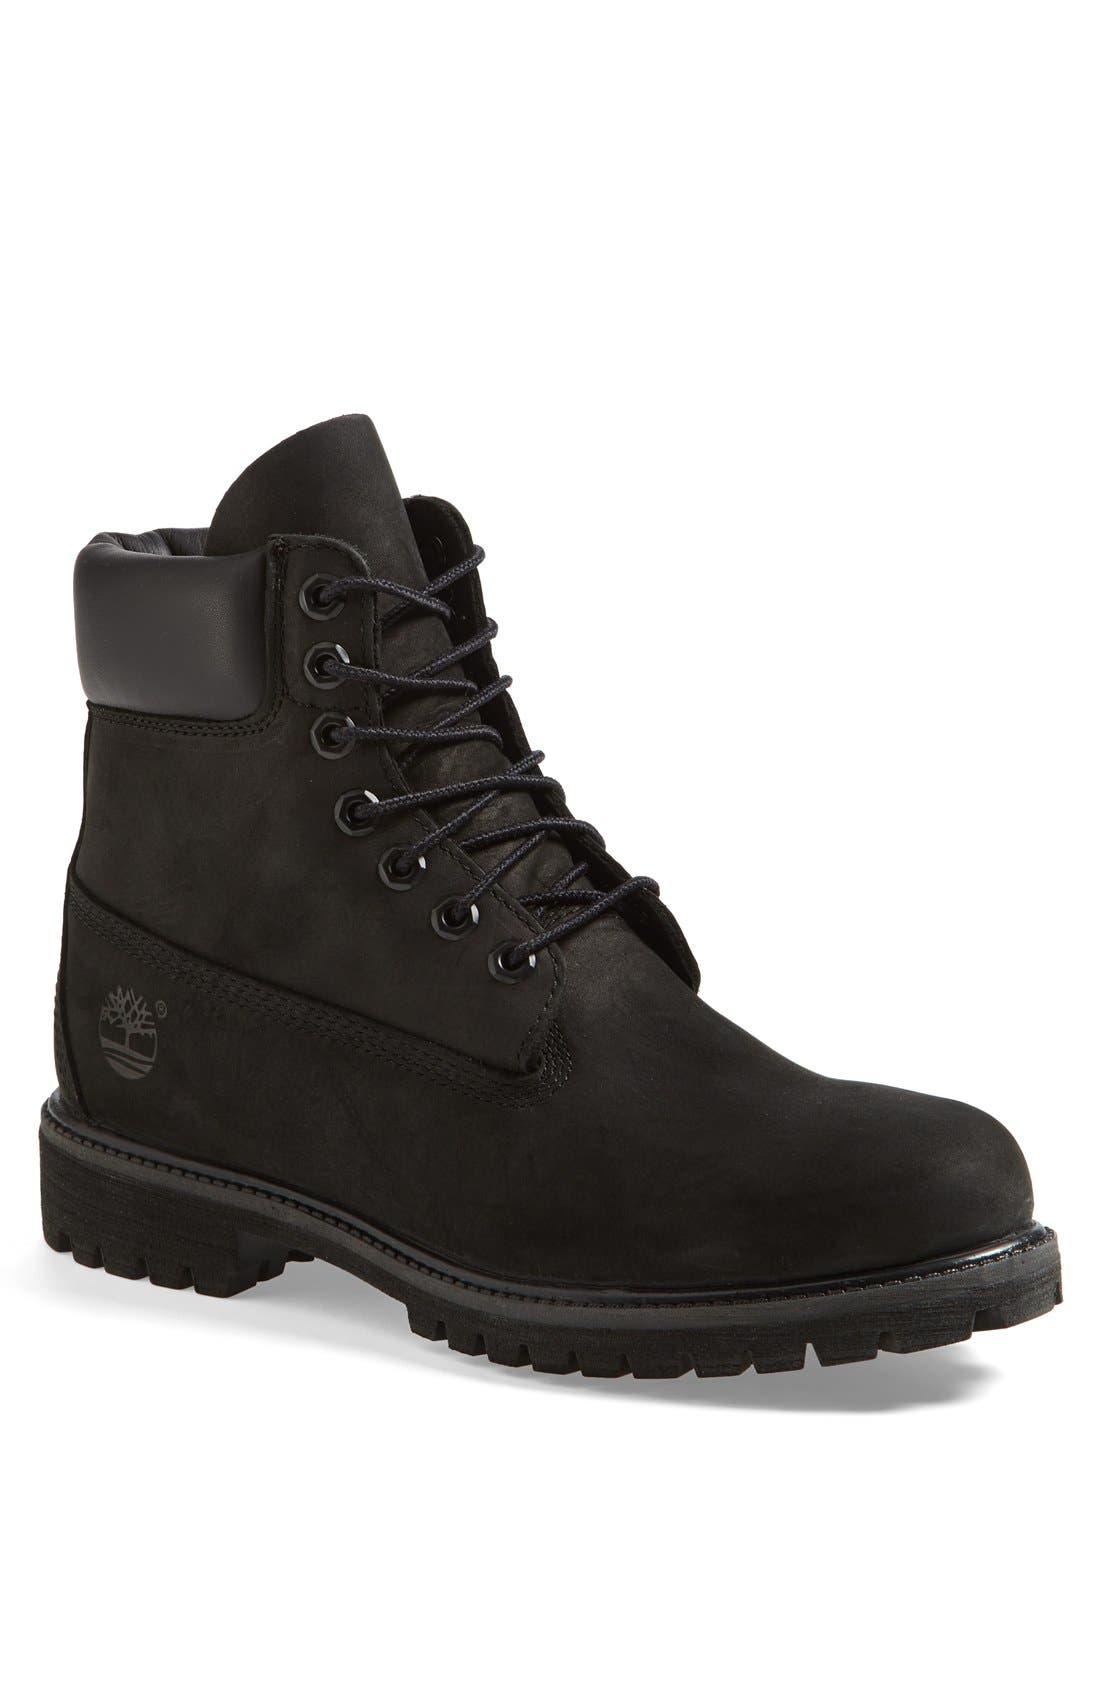 TIMBERLAND Six Inch Classic Waterproof Boots - Premium Waterproof Boot, Main, color, BLACK